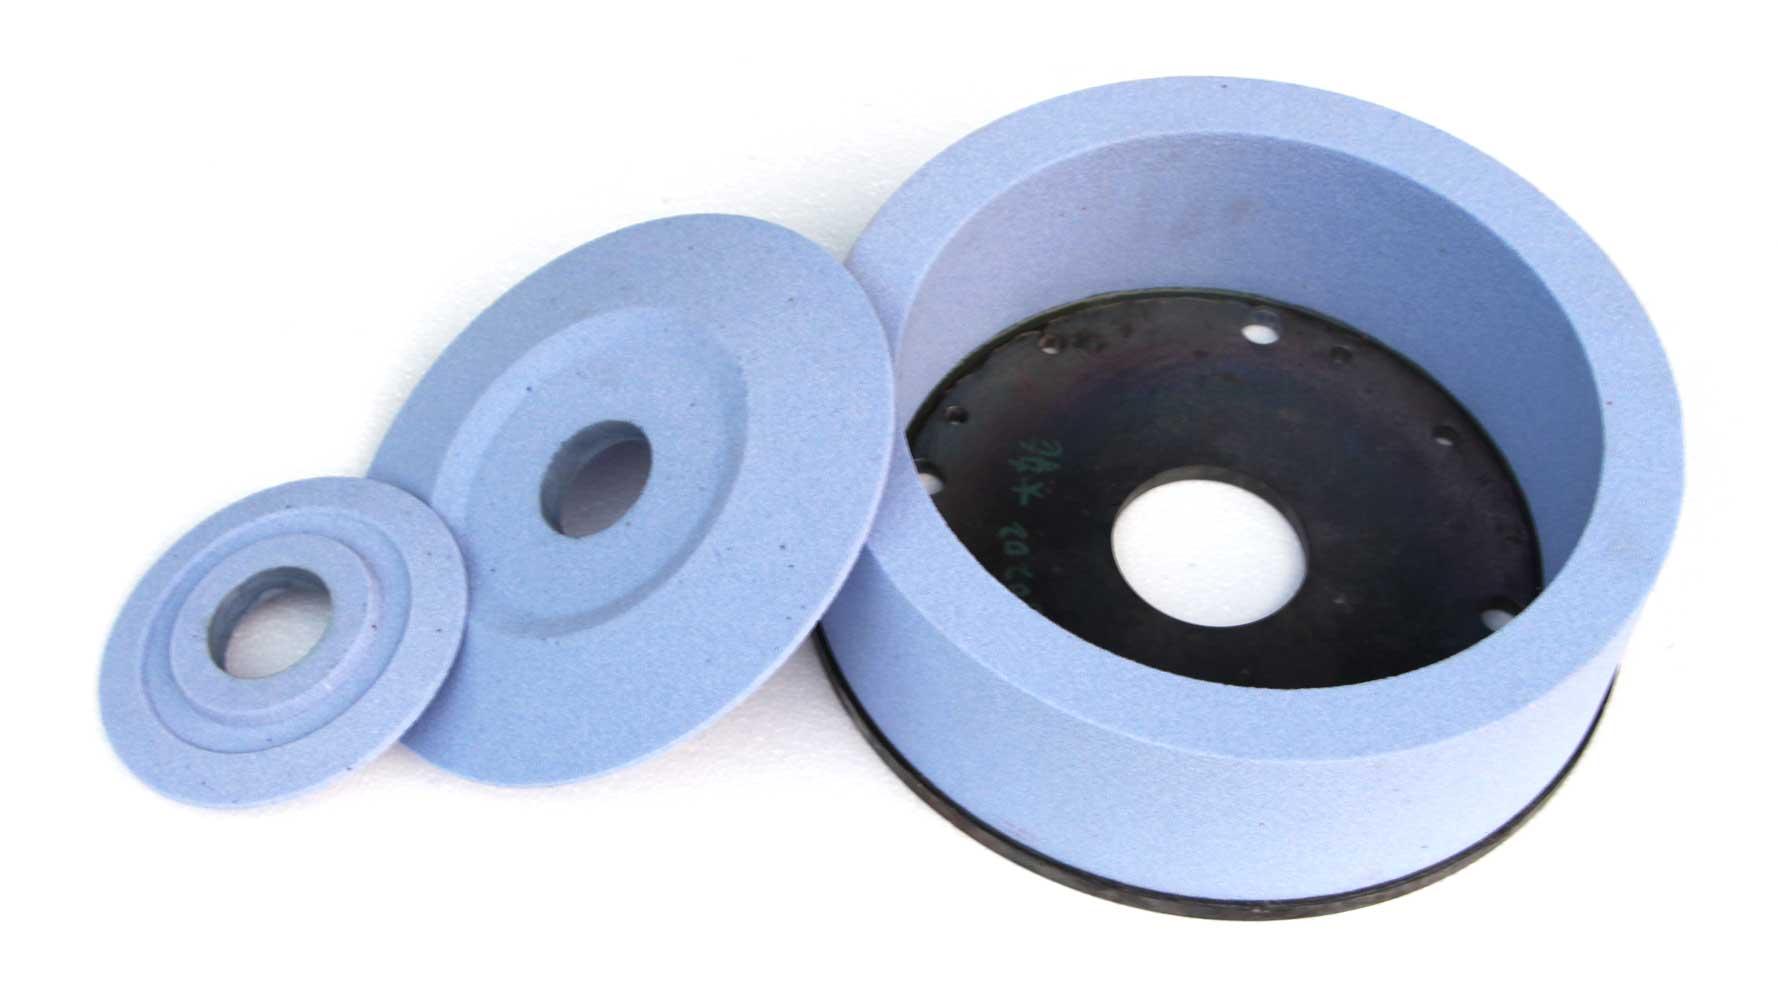 resin and ceramic grinding wheel